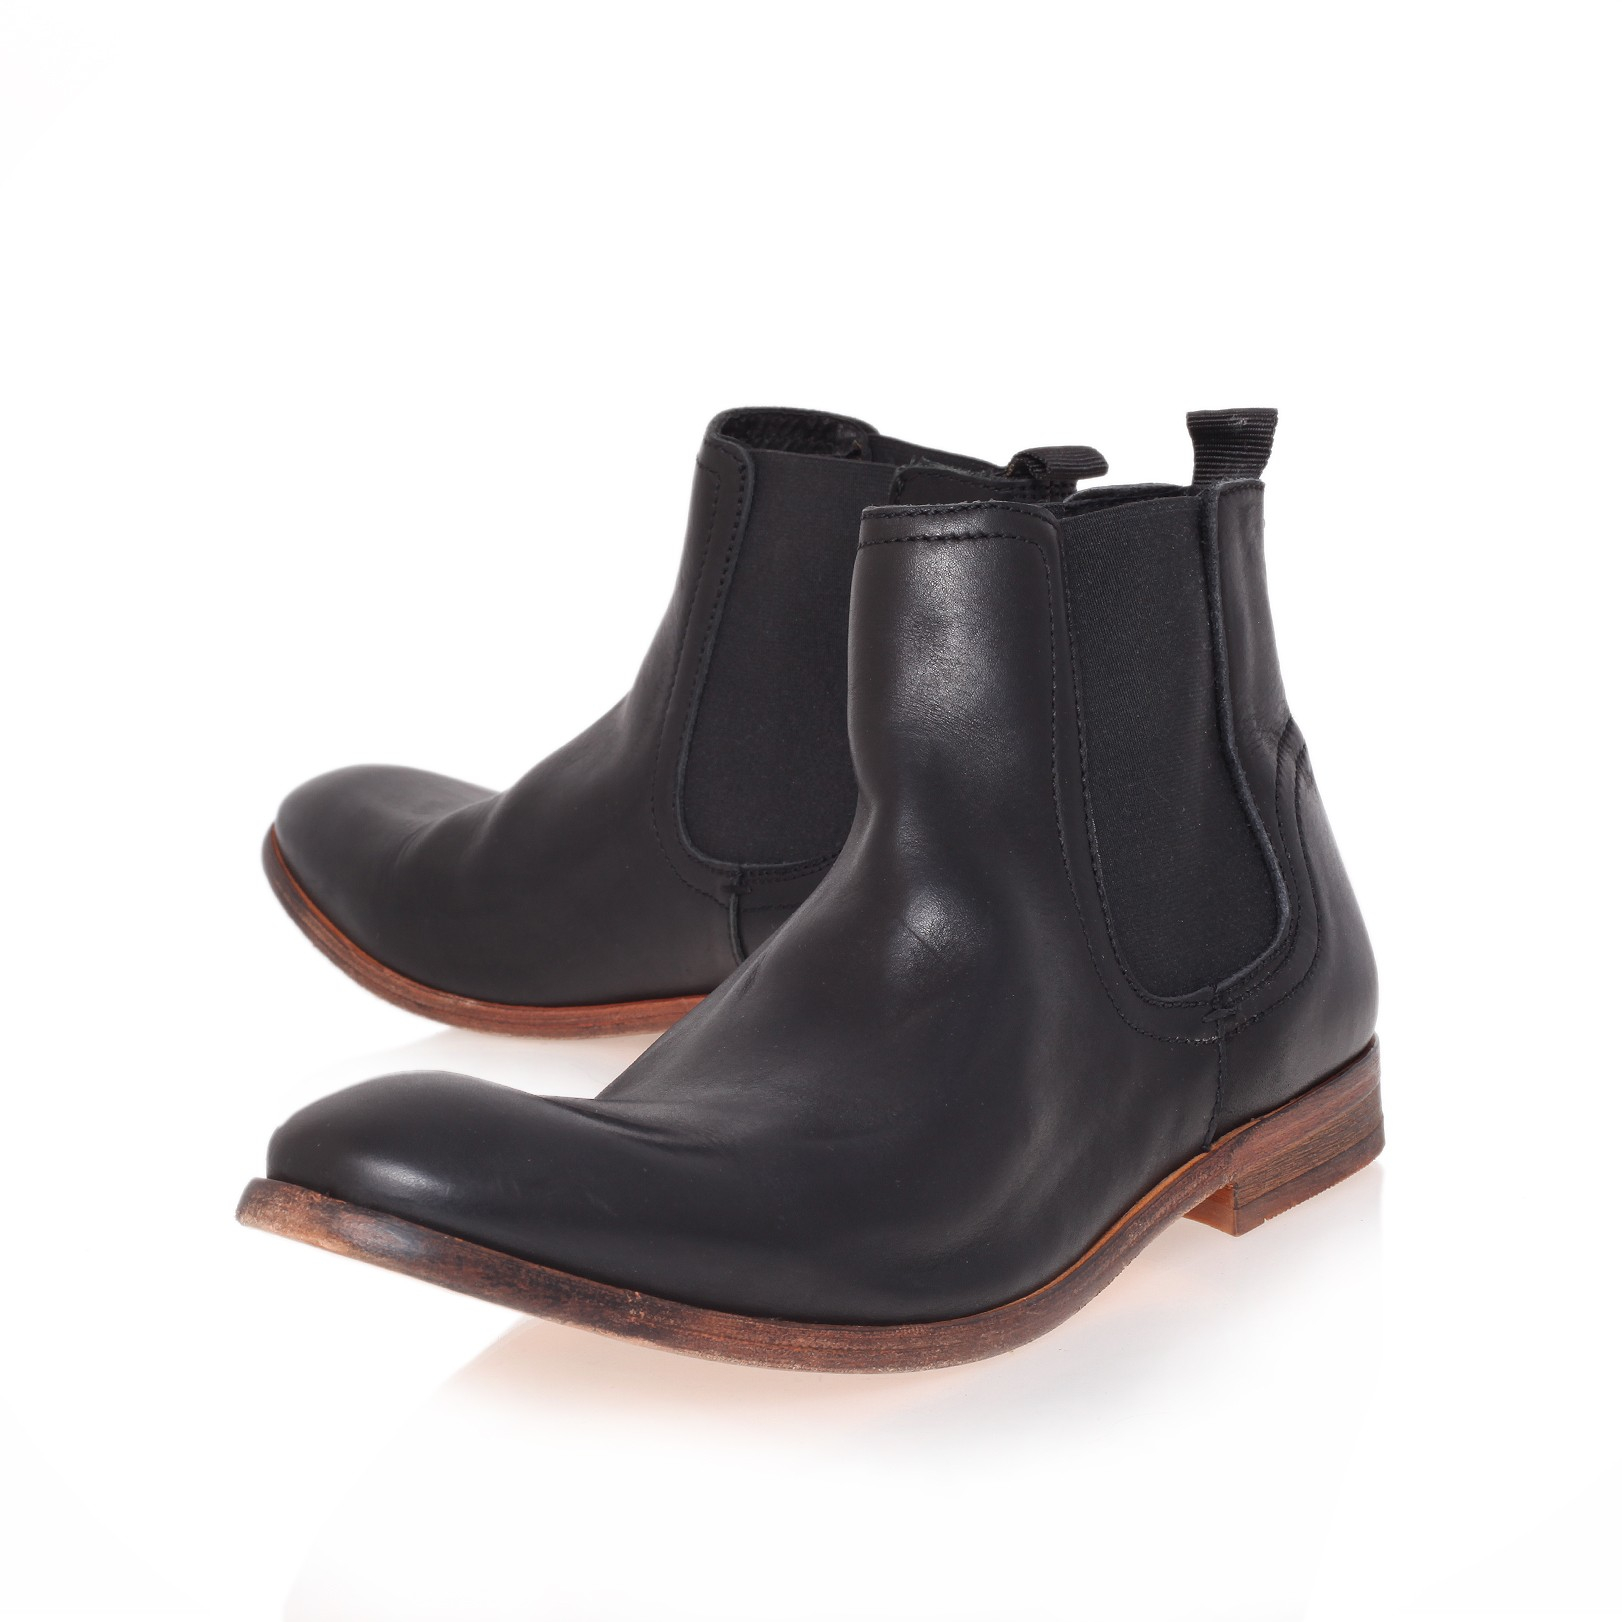 h by hudson patterson chelsea boot in black for men lyst. Black Bedroom Furniture Sets. Home Design Ideas